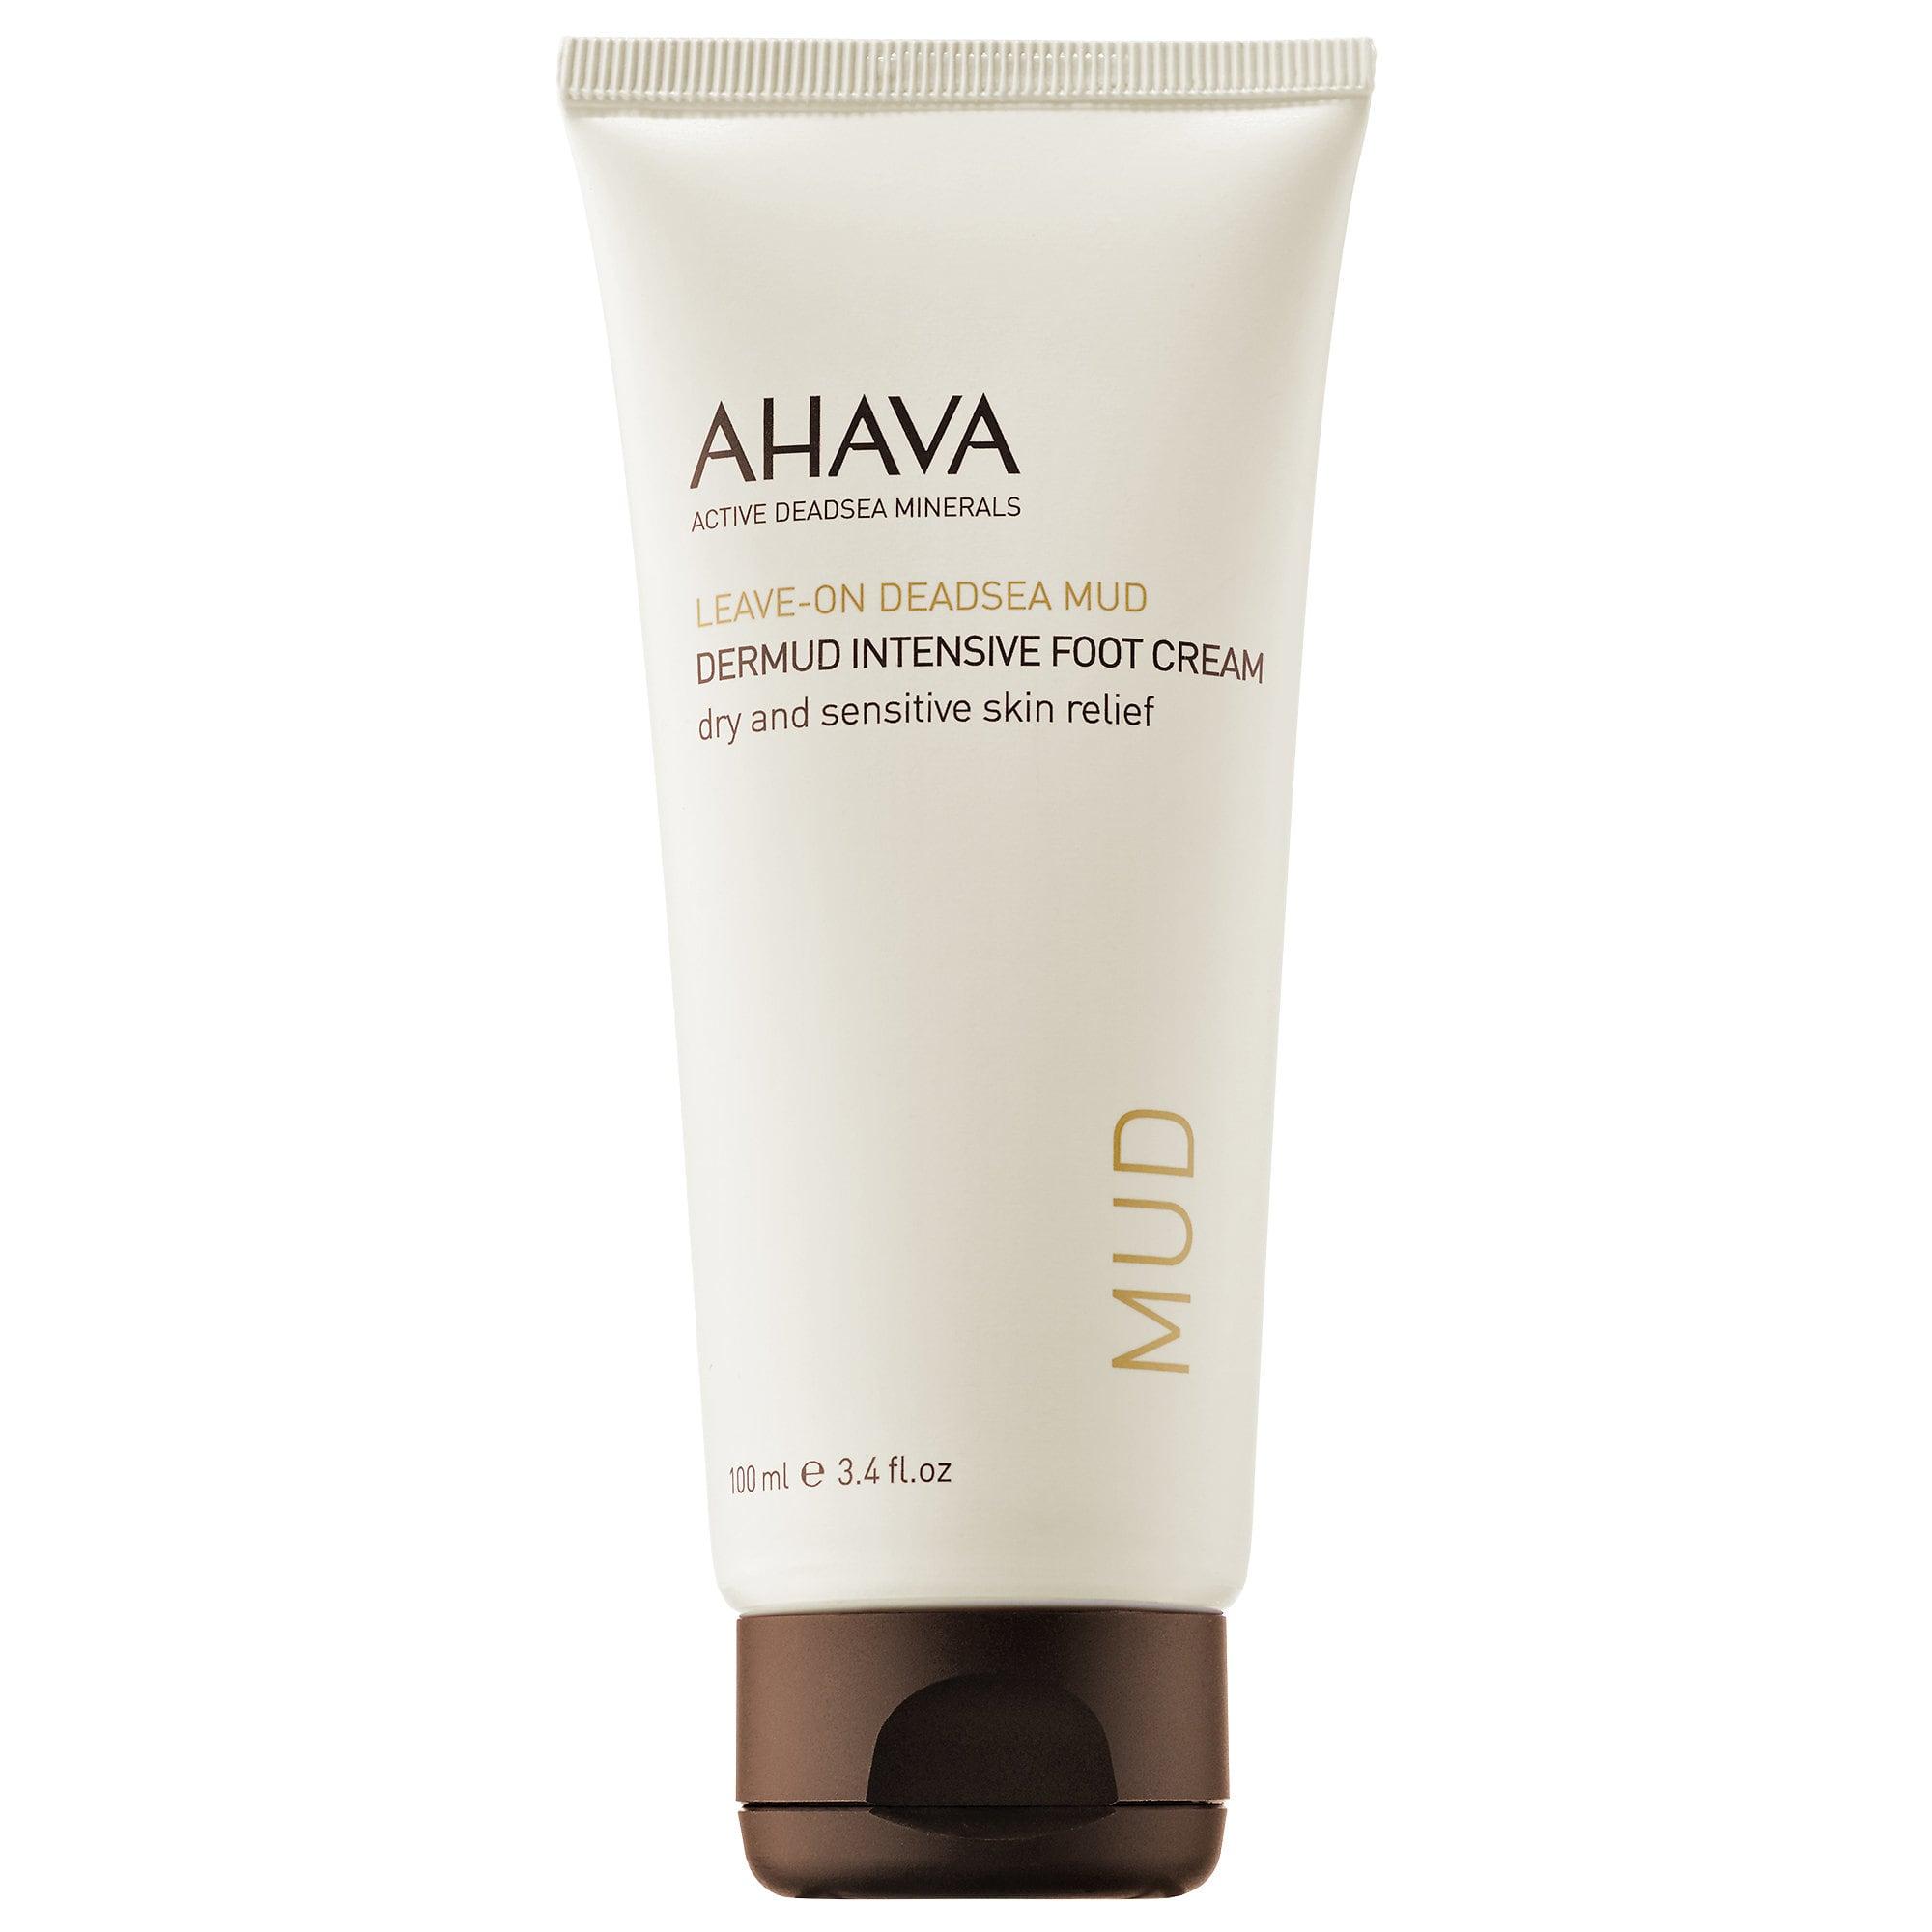 AHAVA - Dermud Intensive Foot Cream 100 ml